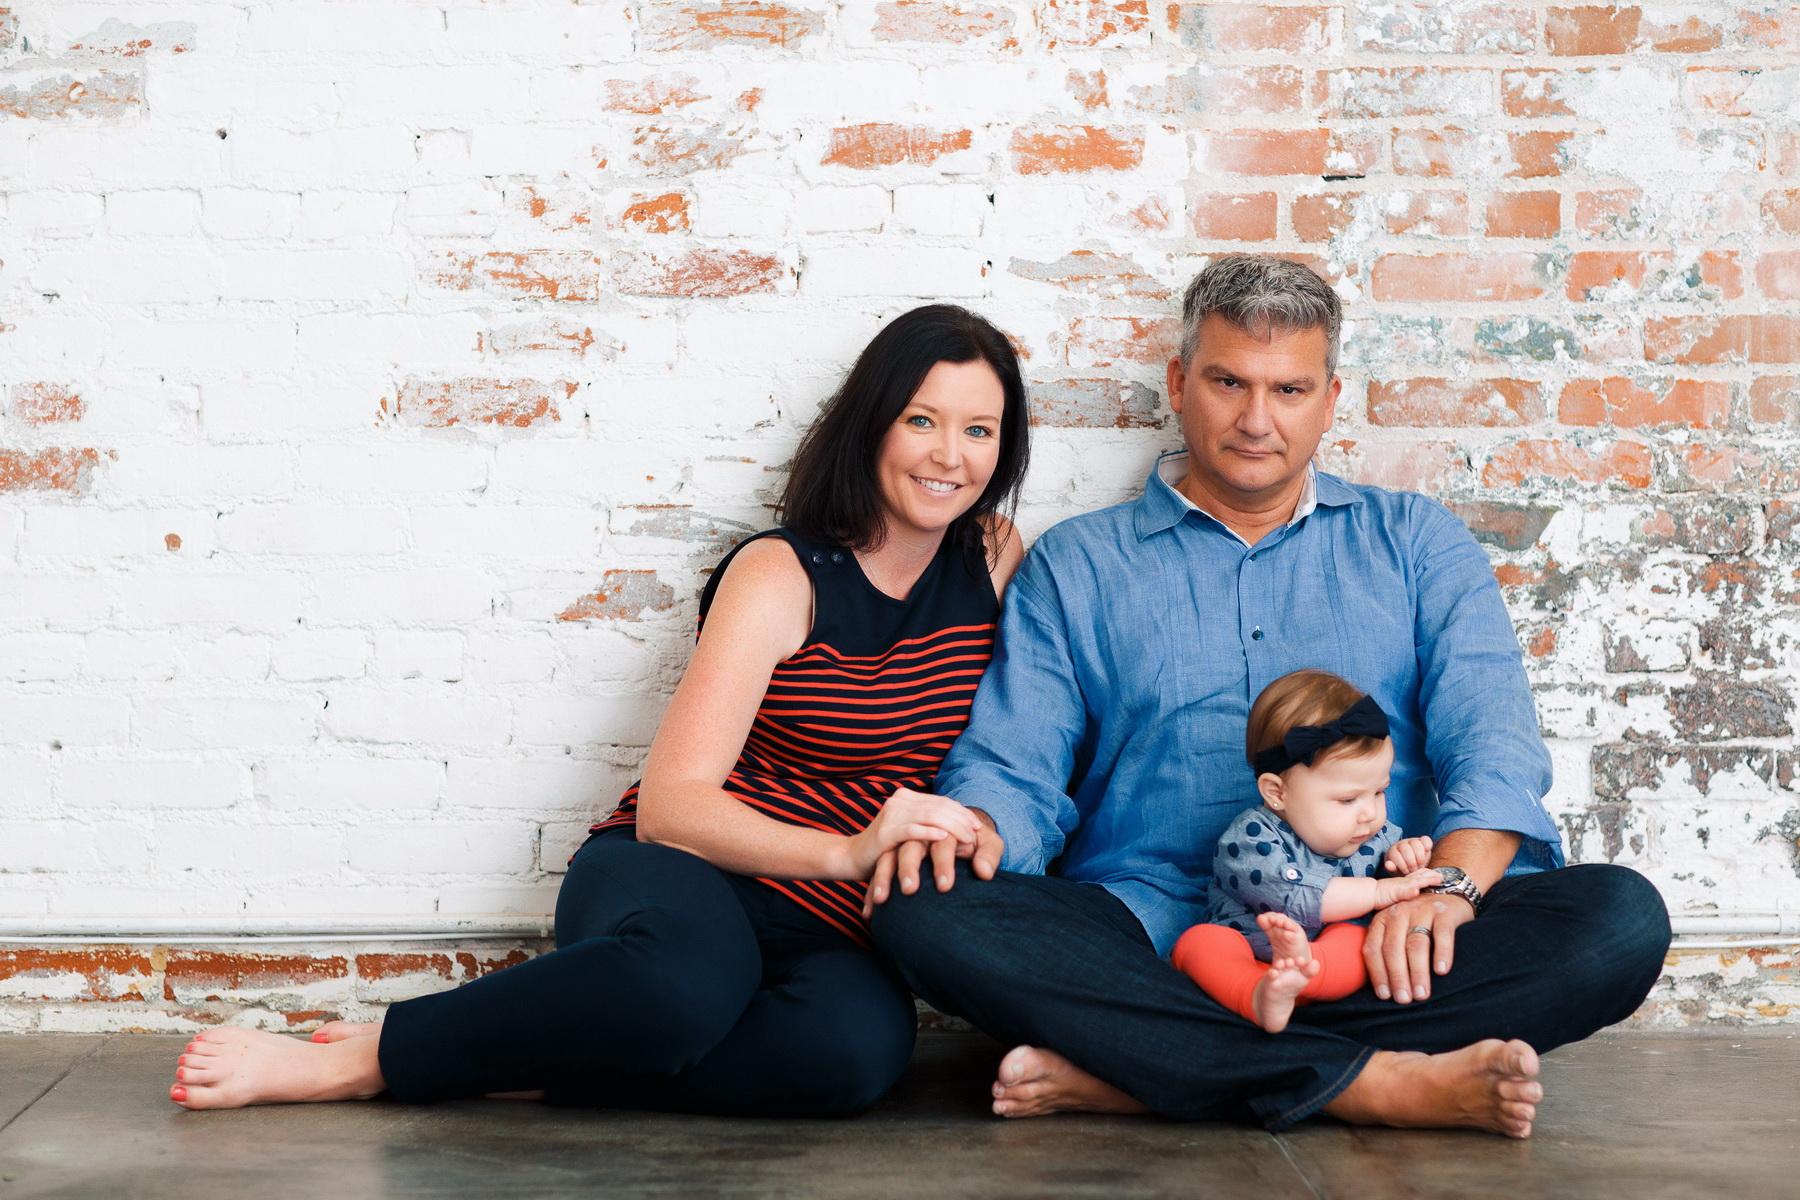 BAH HUMBUG | Dad is loving this family Photo Shoot